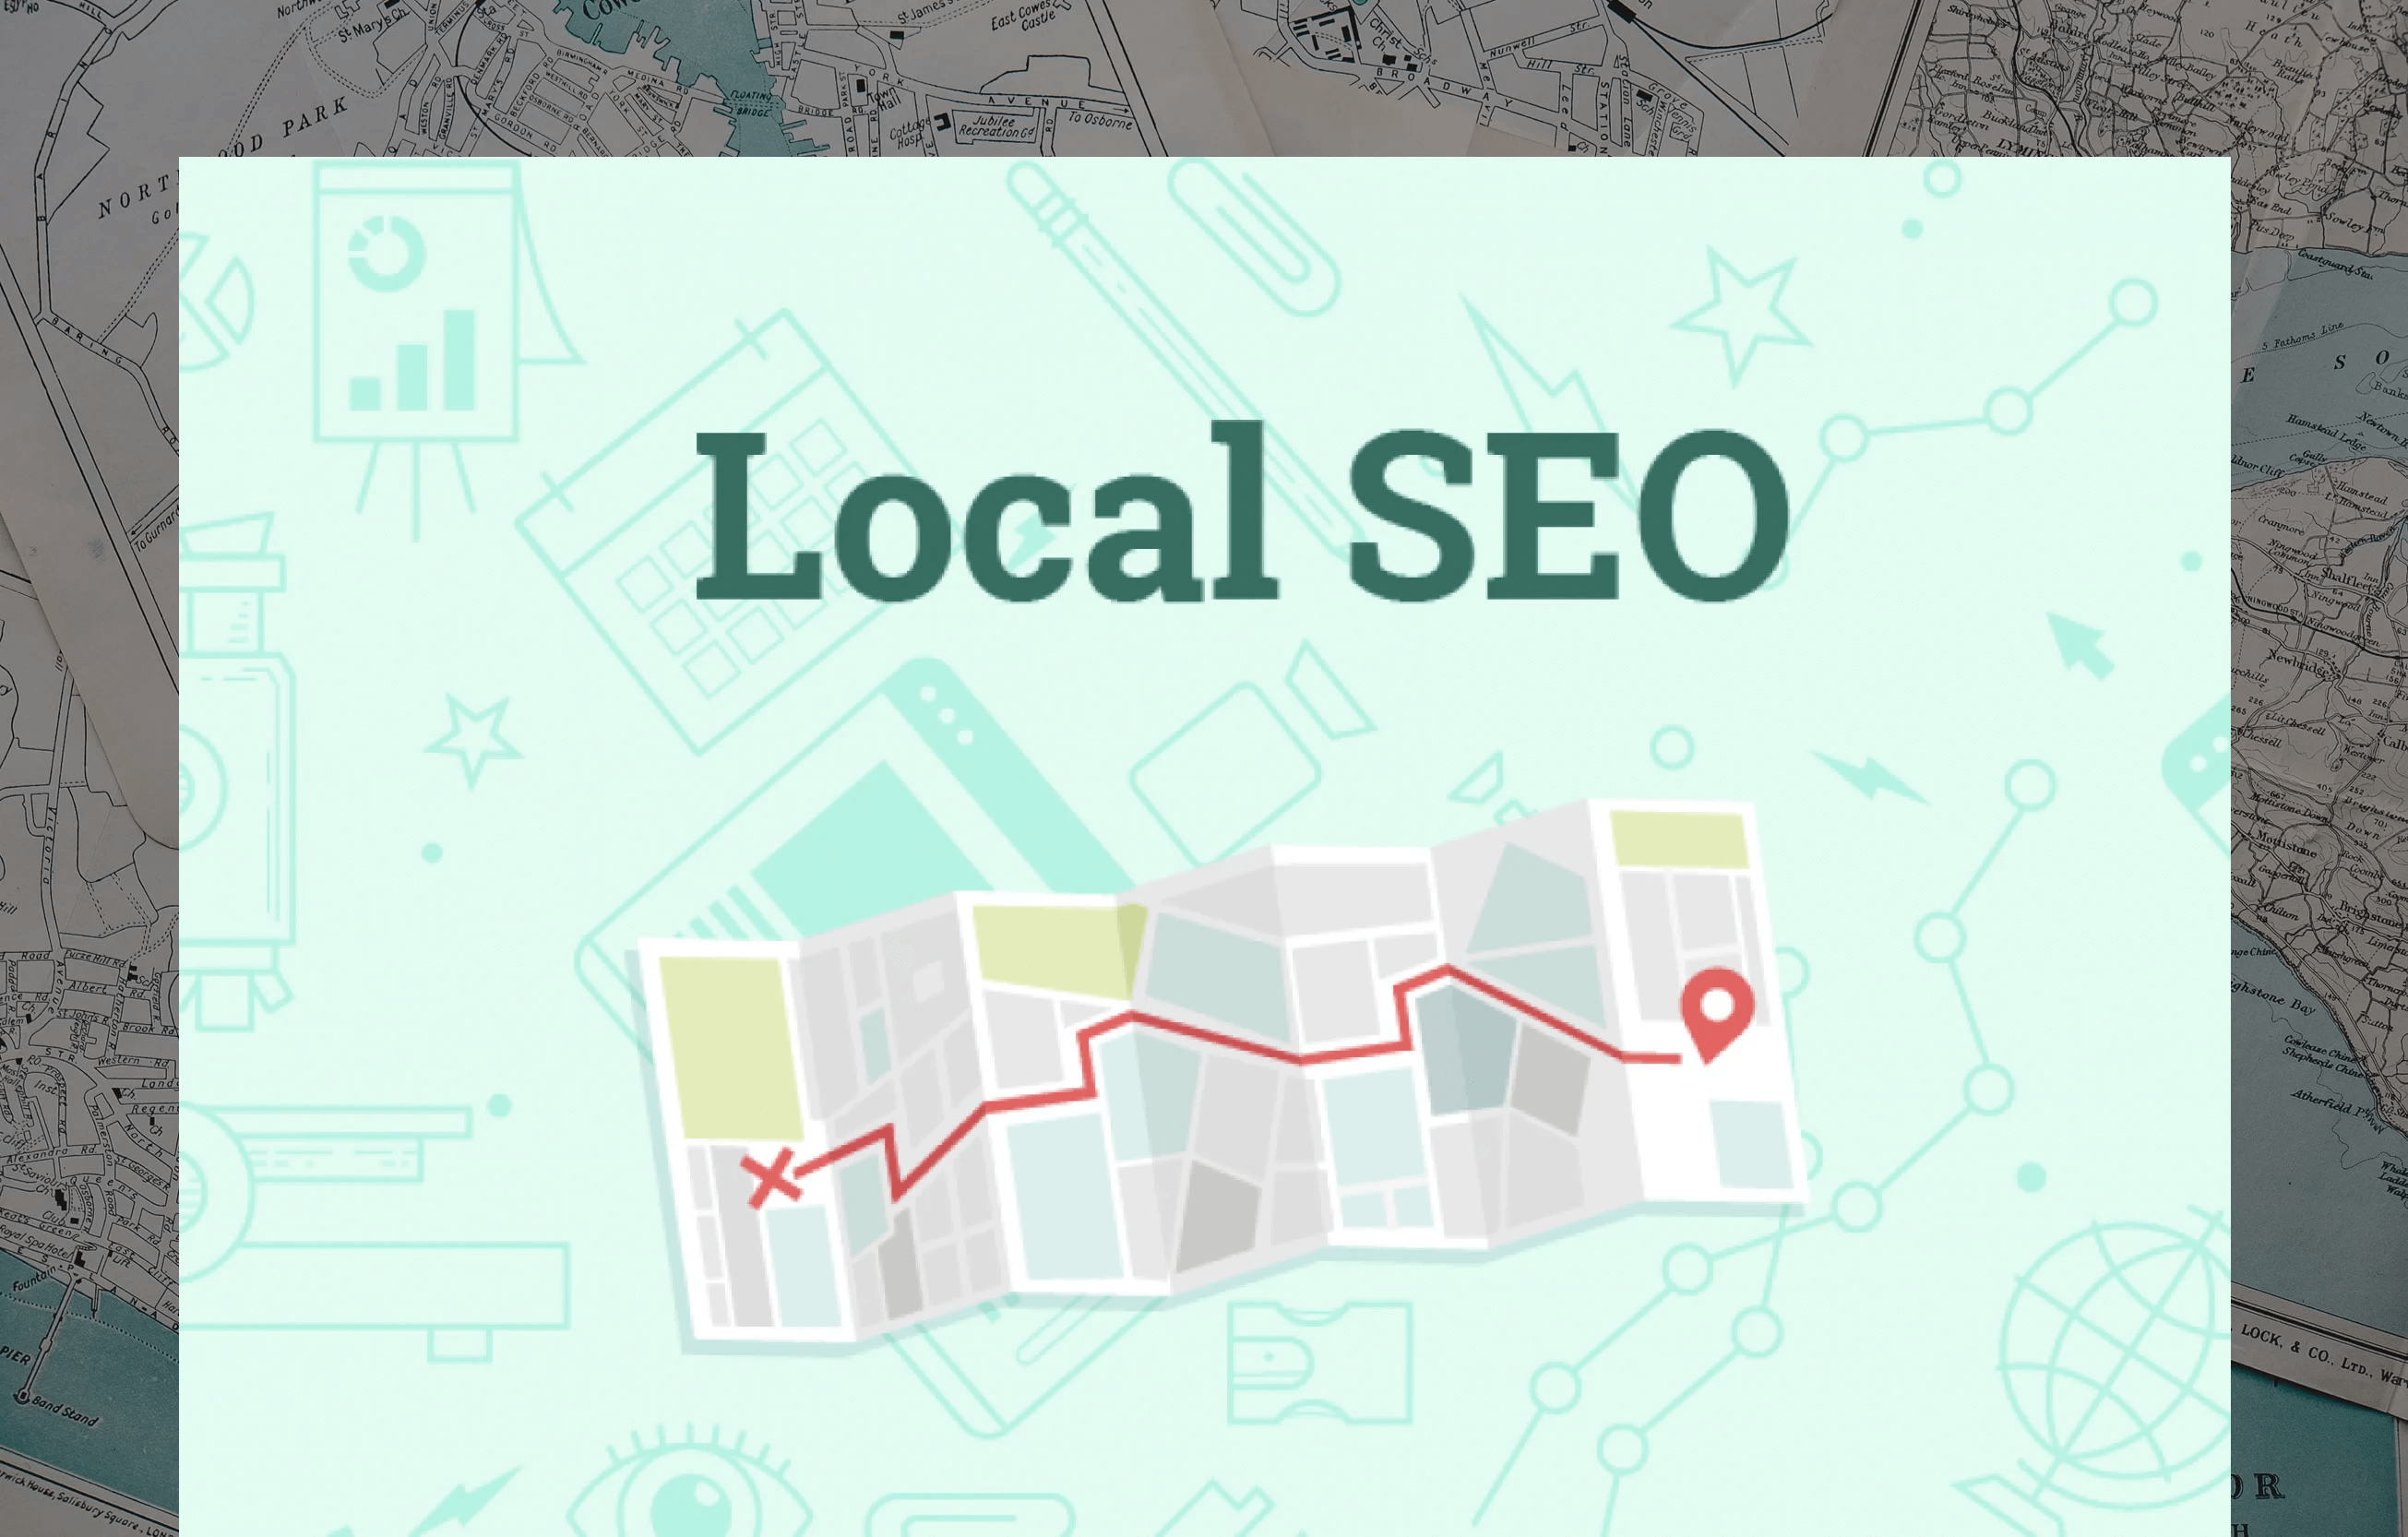 Local SEO Services | The Creative Momentum Atlanta, GA Web Design & Digital Marketing